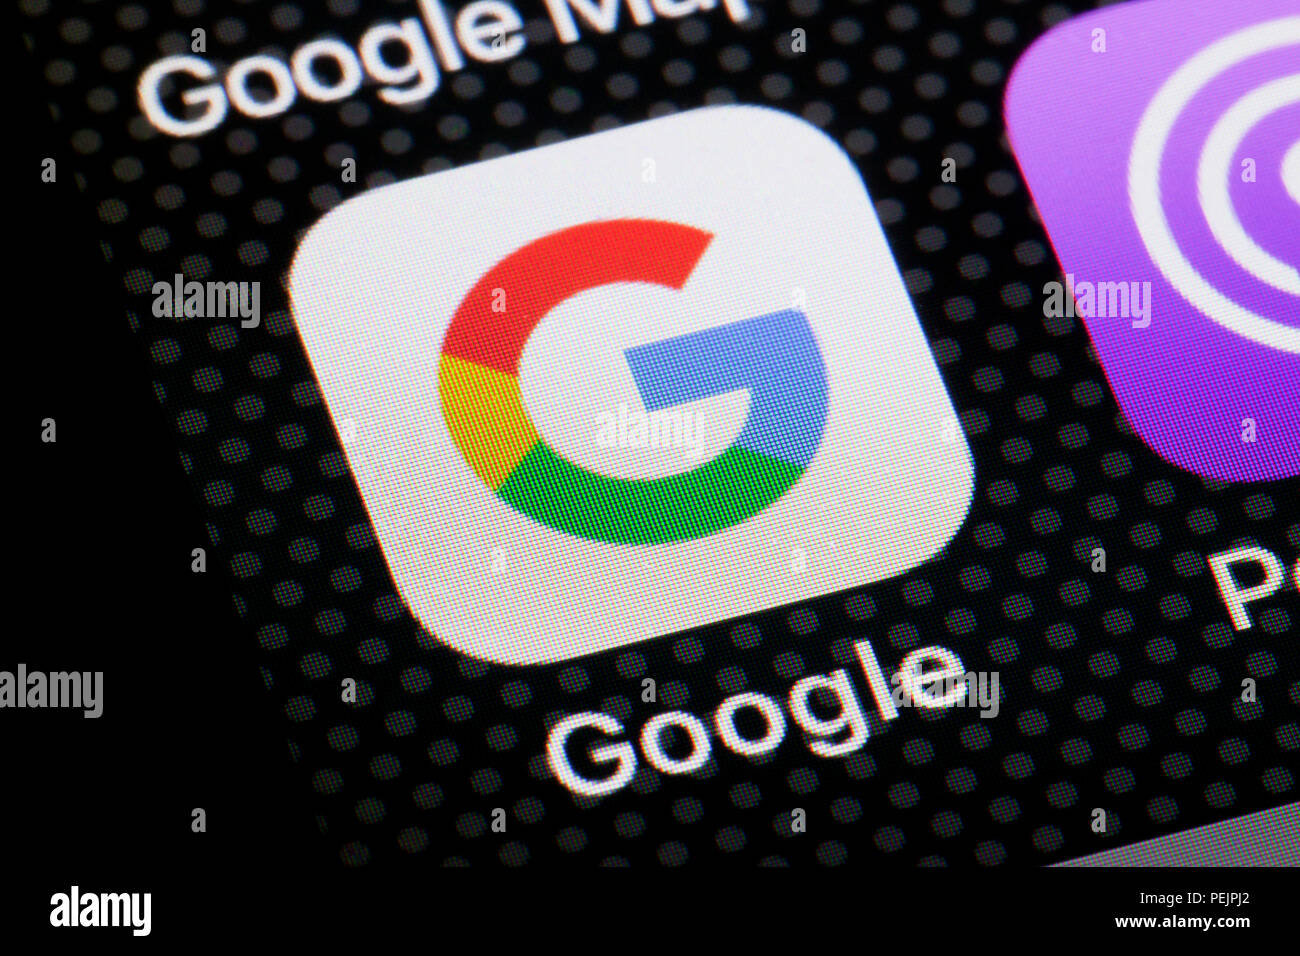 Google app icon on iPhone screen - USA - Stock Image